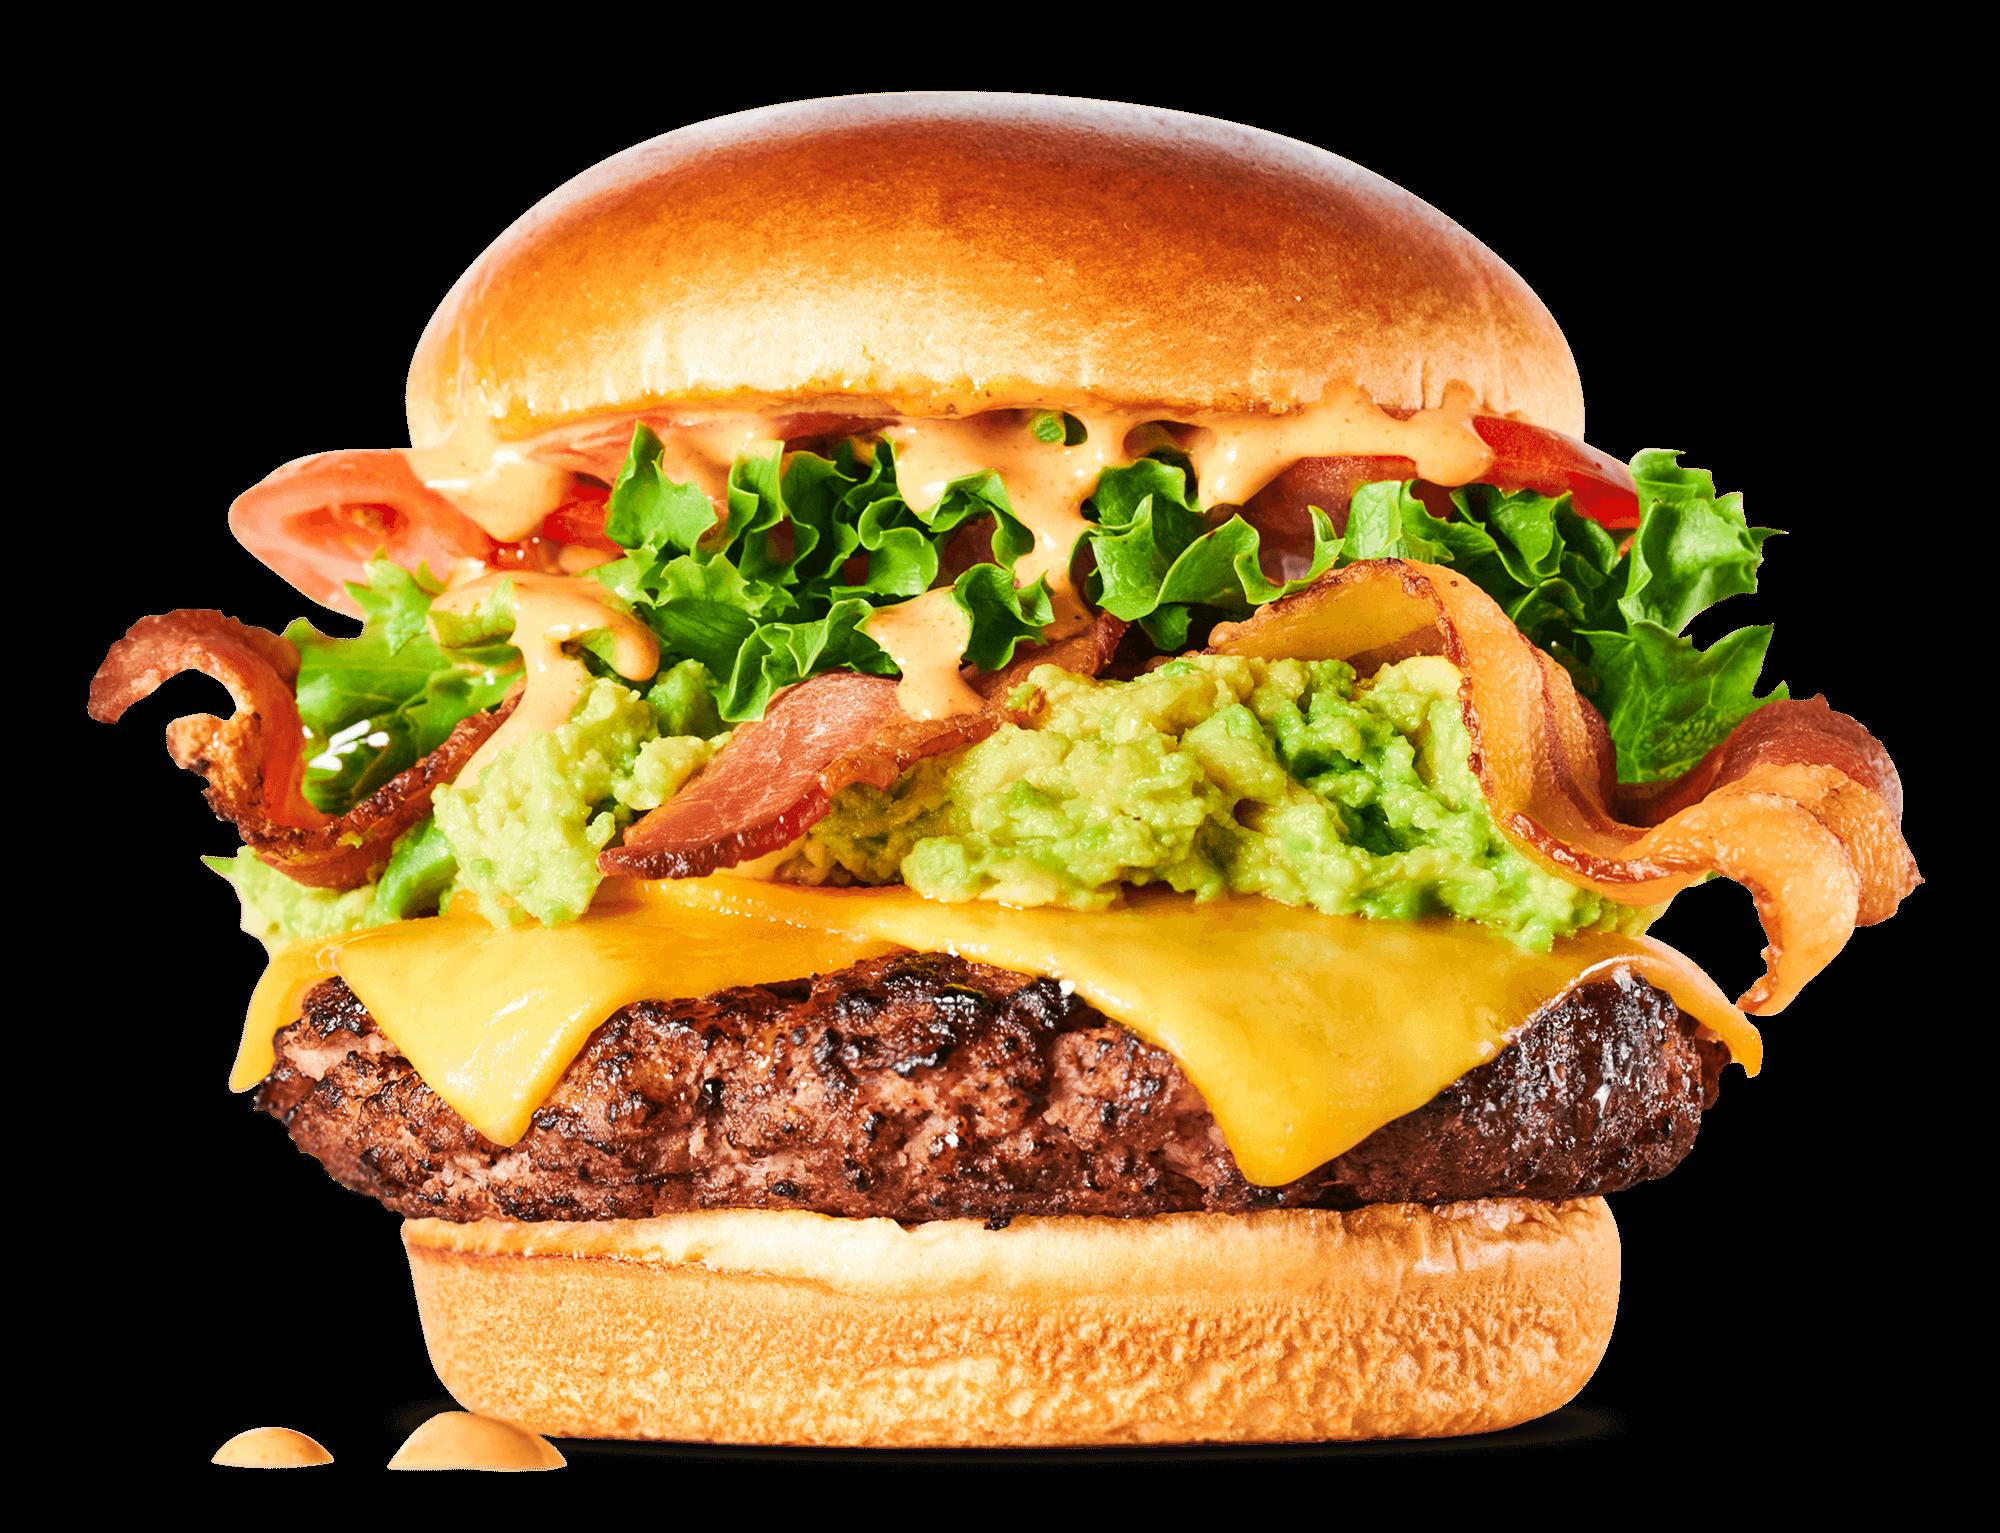 The Trailblazer Burger by Crave Burger